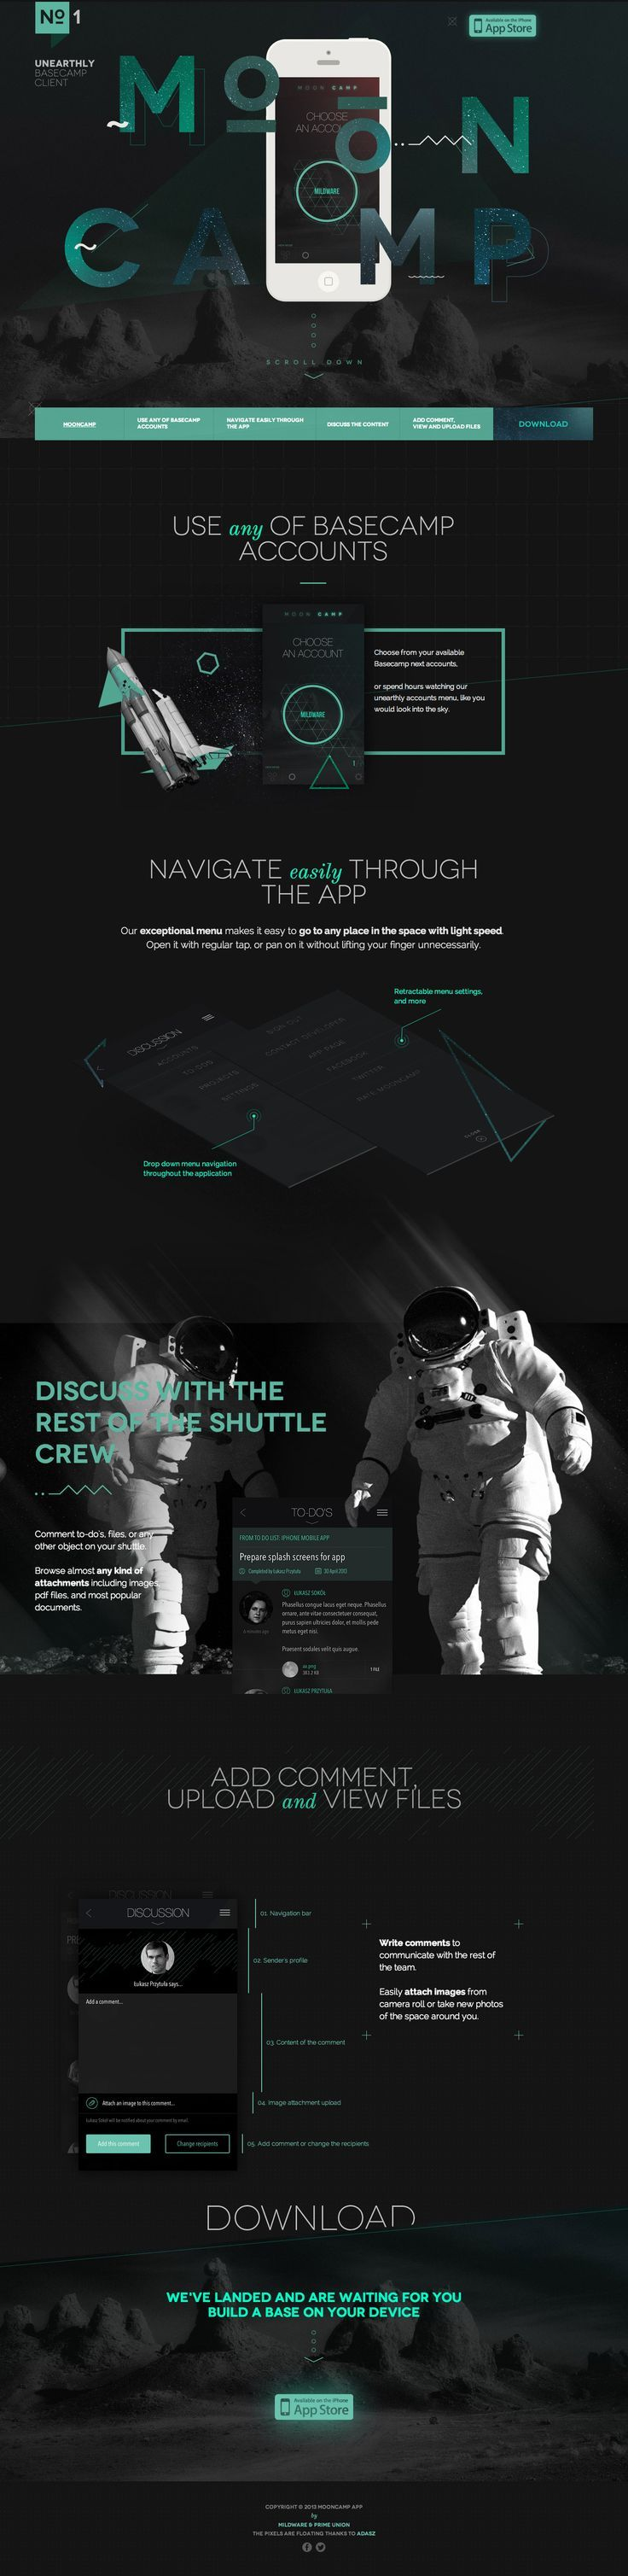 UI Designs for the Web | Abduzeedo Design Inspiration